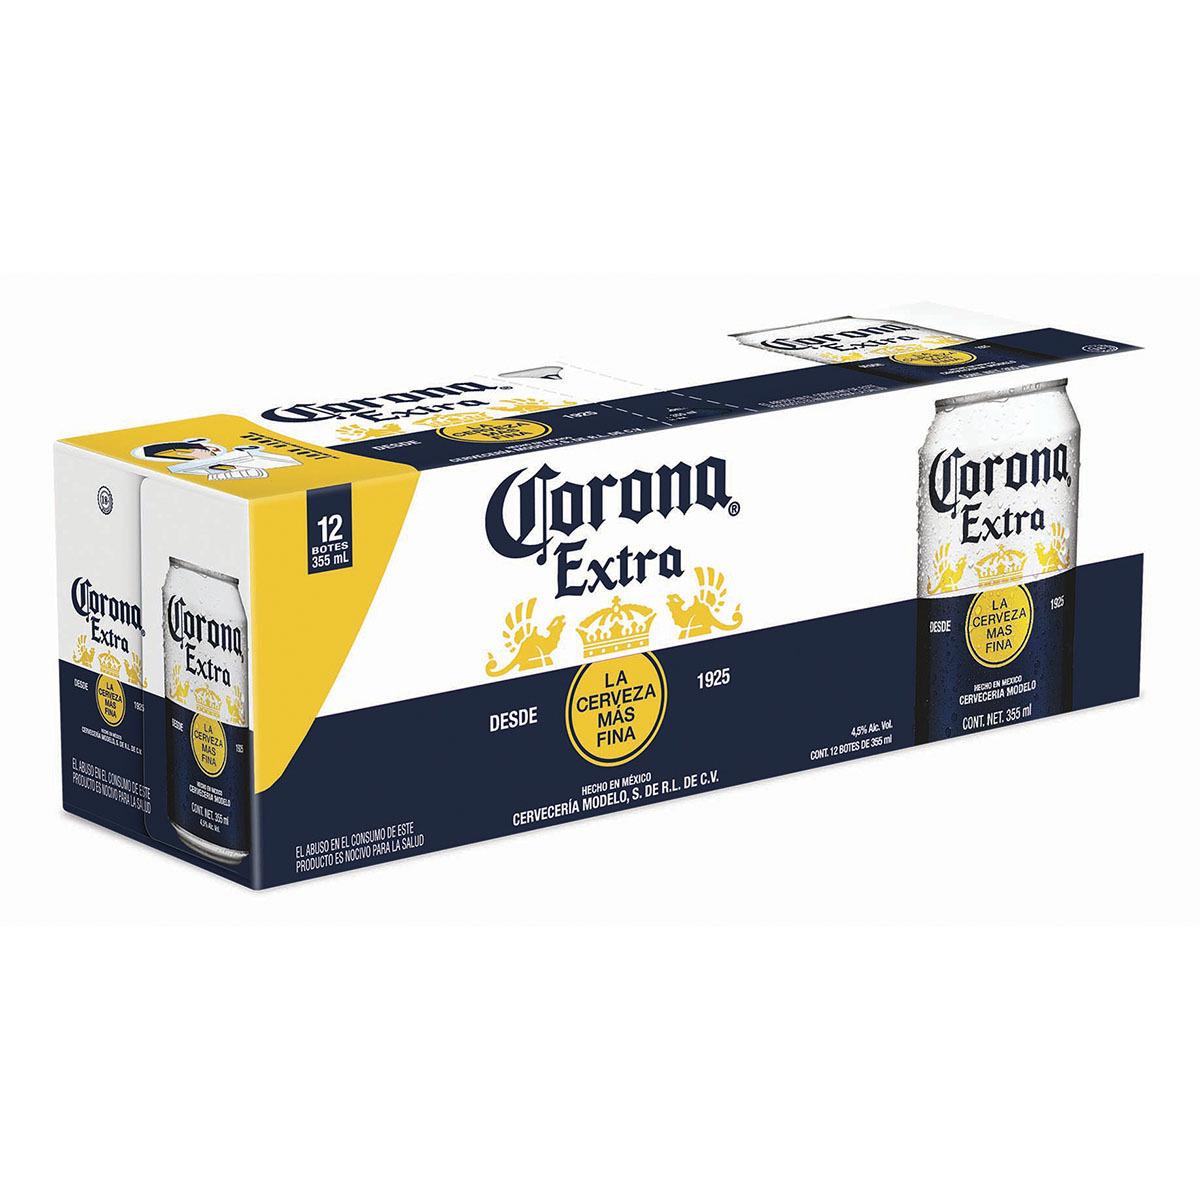 Chedraui 12 de cerveza en lata corona extra